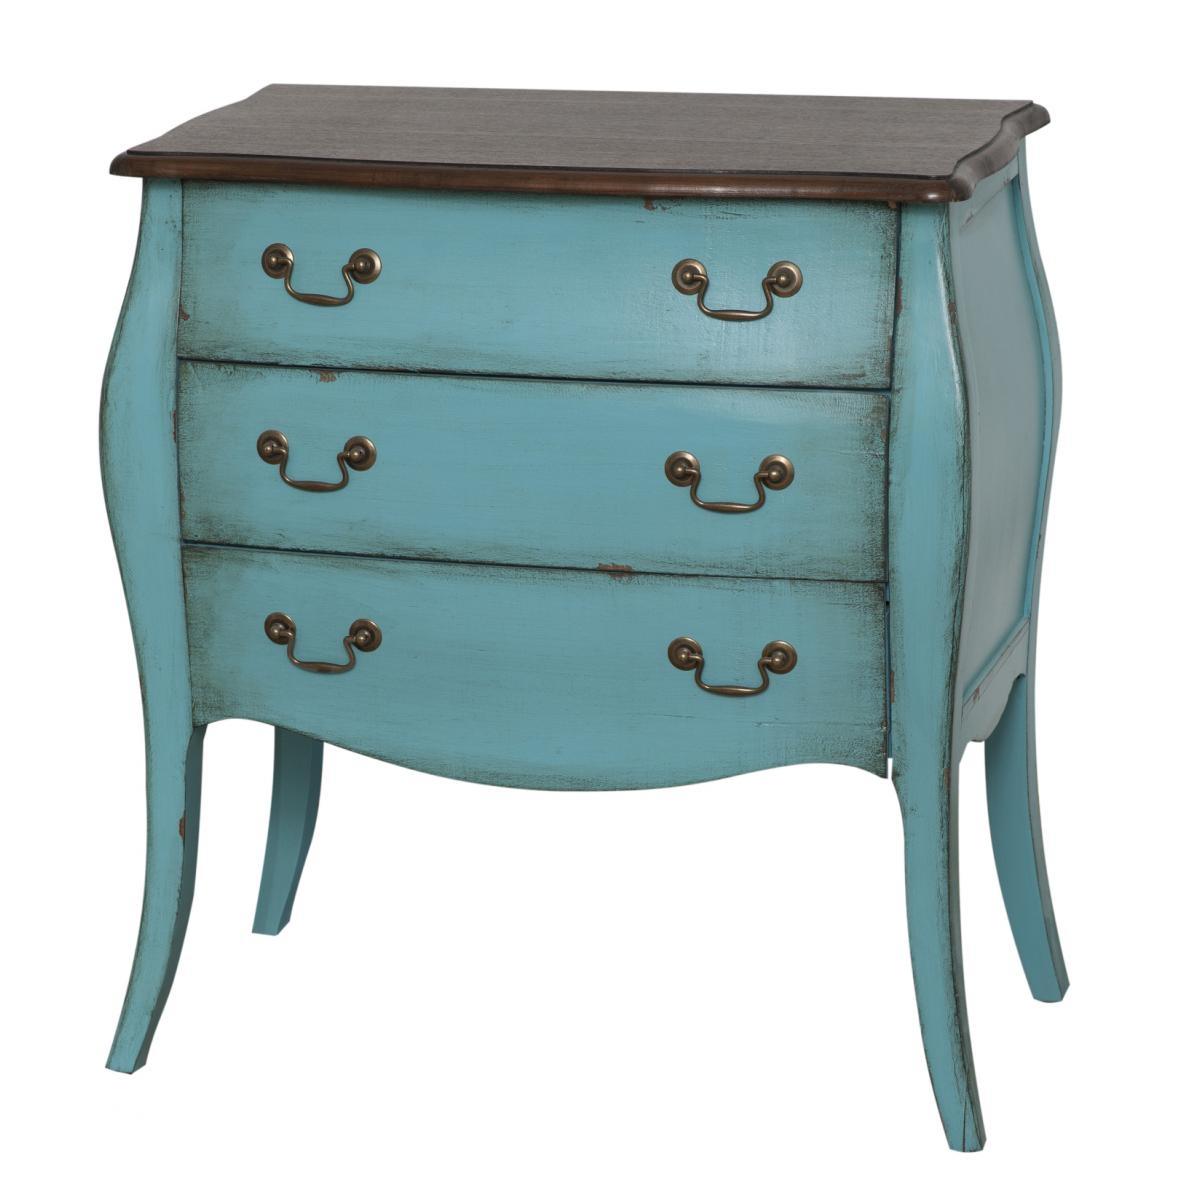 Cabinet din lemn de plop, furnir si MDF, cu 3 sertare Mellow Medium Turquoise / Brown, l69xA39xH77 cm imagine